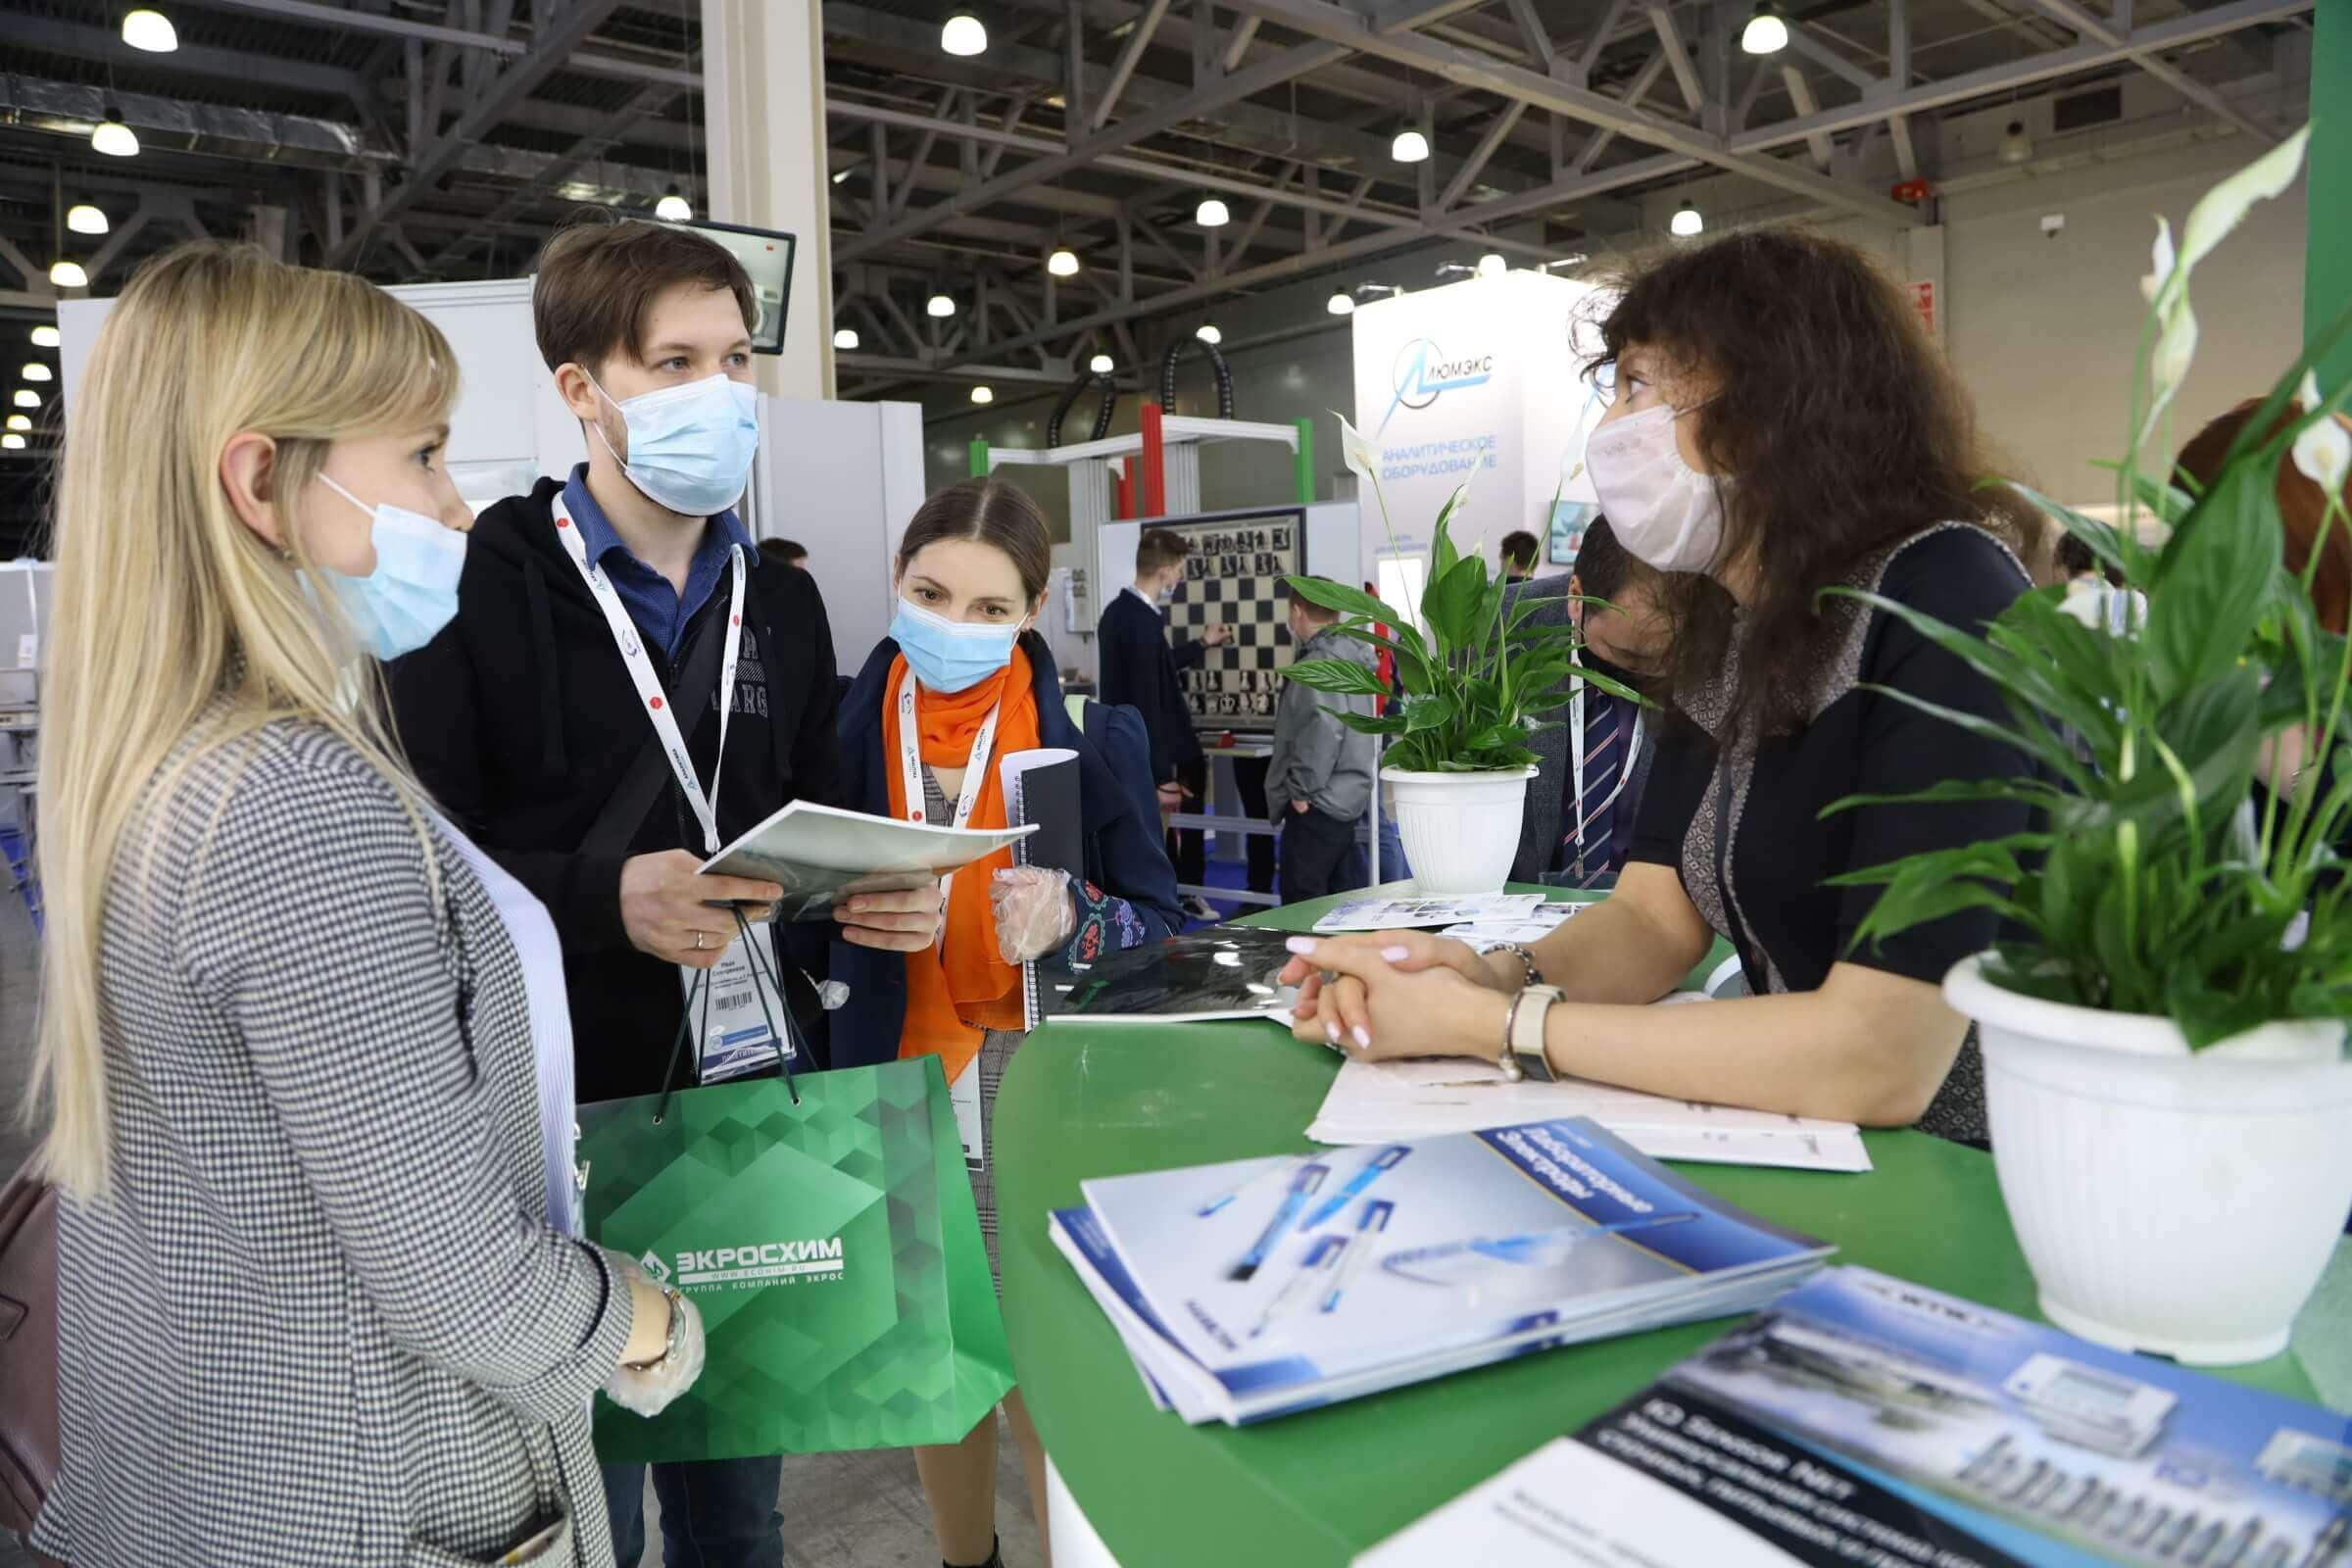 Exhibition for laboratory equipment Analitika Expo 2022